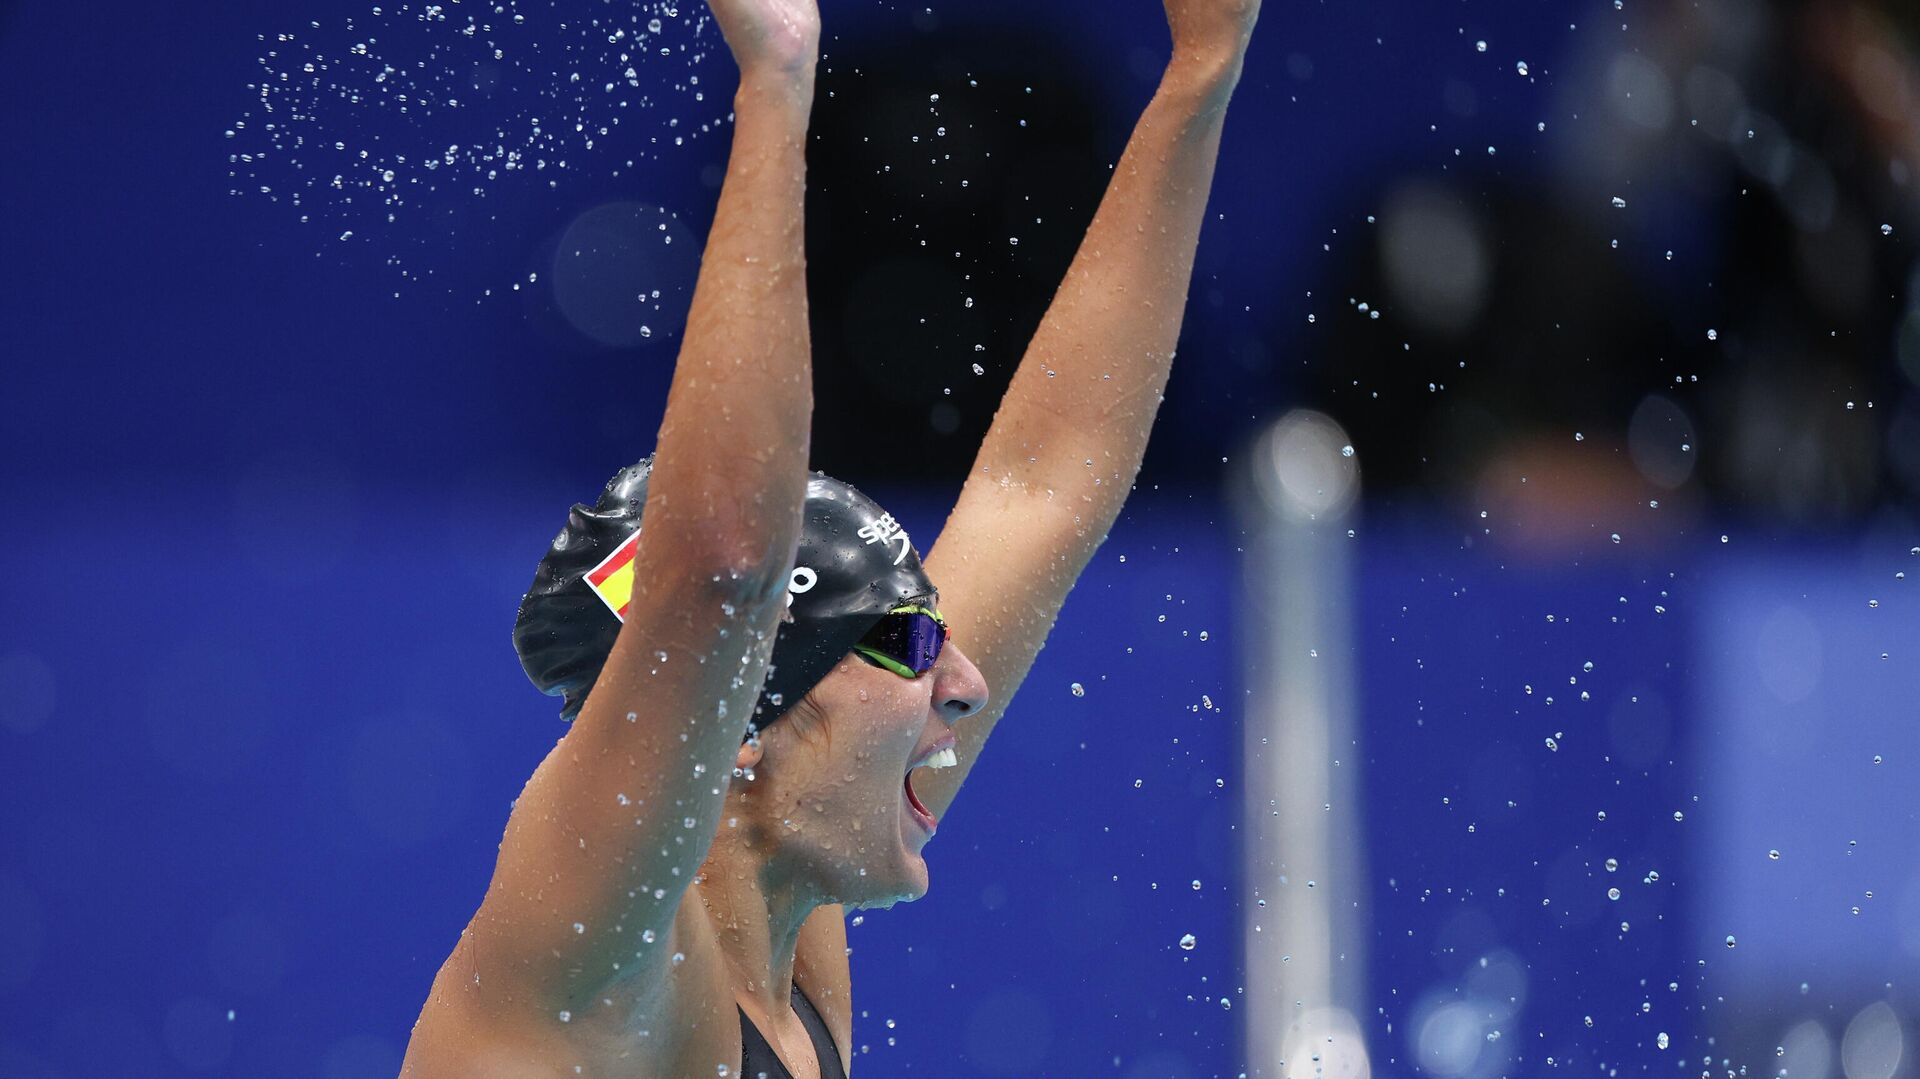 Michelle Alonso, nadadora española  - Sputnik Mundo, 1920, 29.08.2021